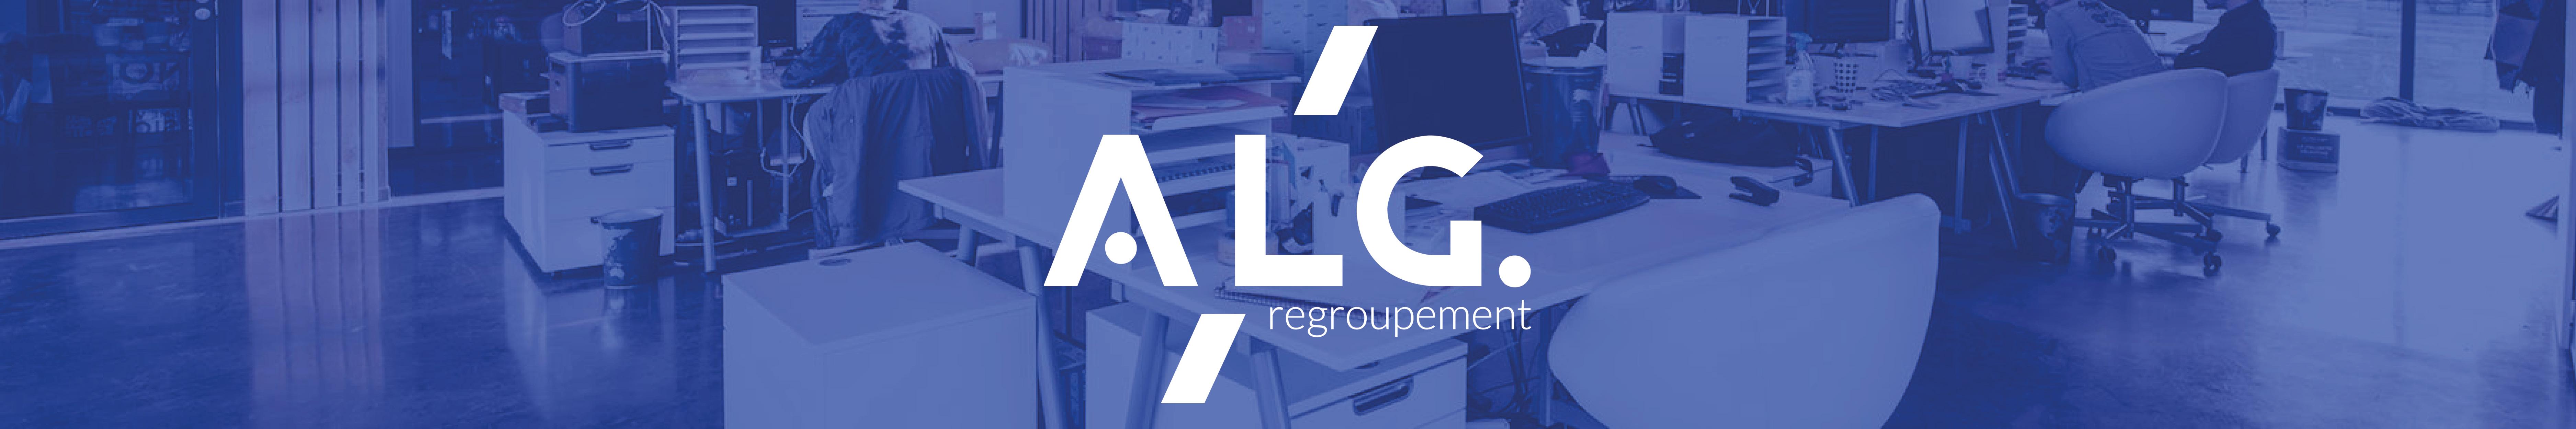 ourtier-financement-alg-regroupement-odace